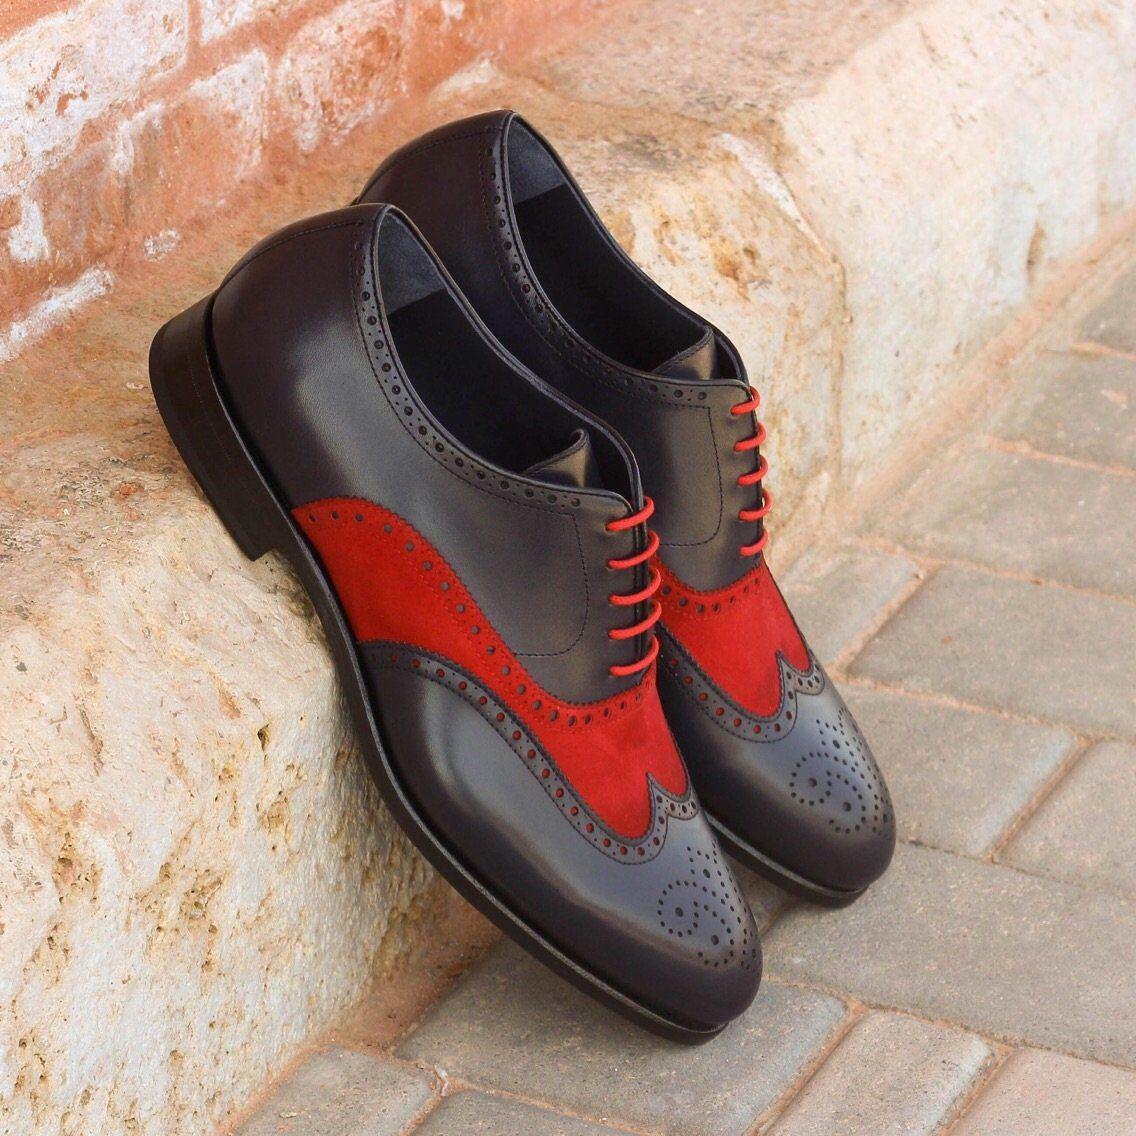 Unique Handcrafted Red Patent Full Brogue Wingtip Dress Shoes Men Dress Shoes Mens Fashion Shoes [ 1136 x 1136 Pixel ]